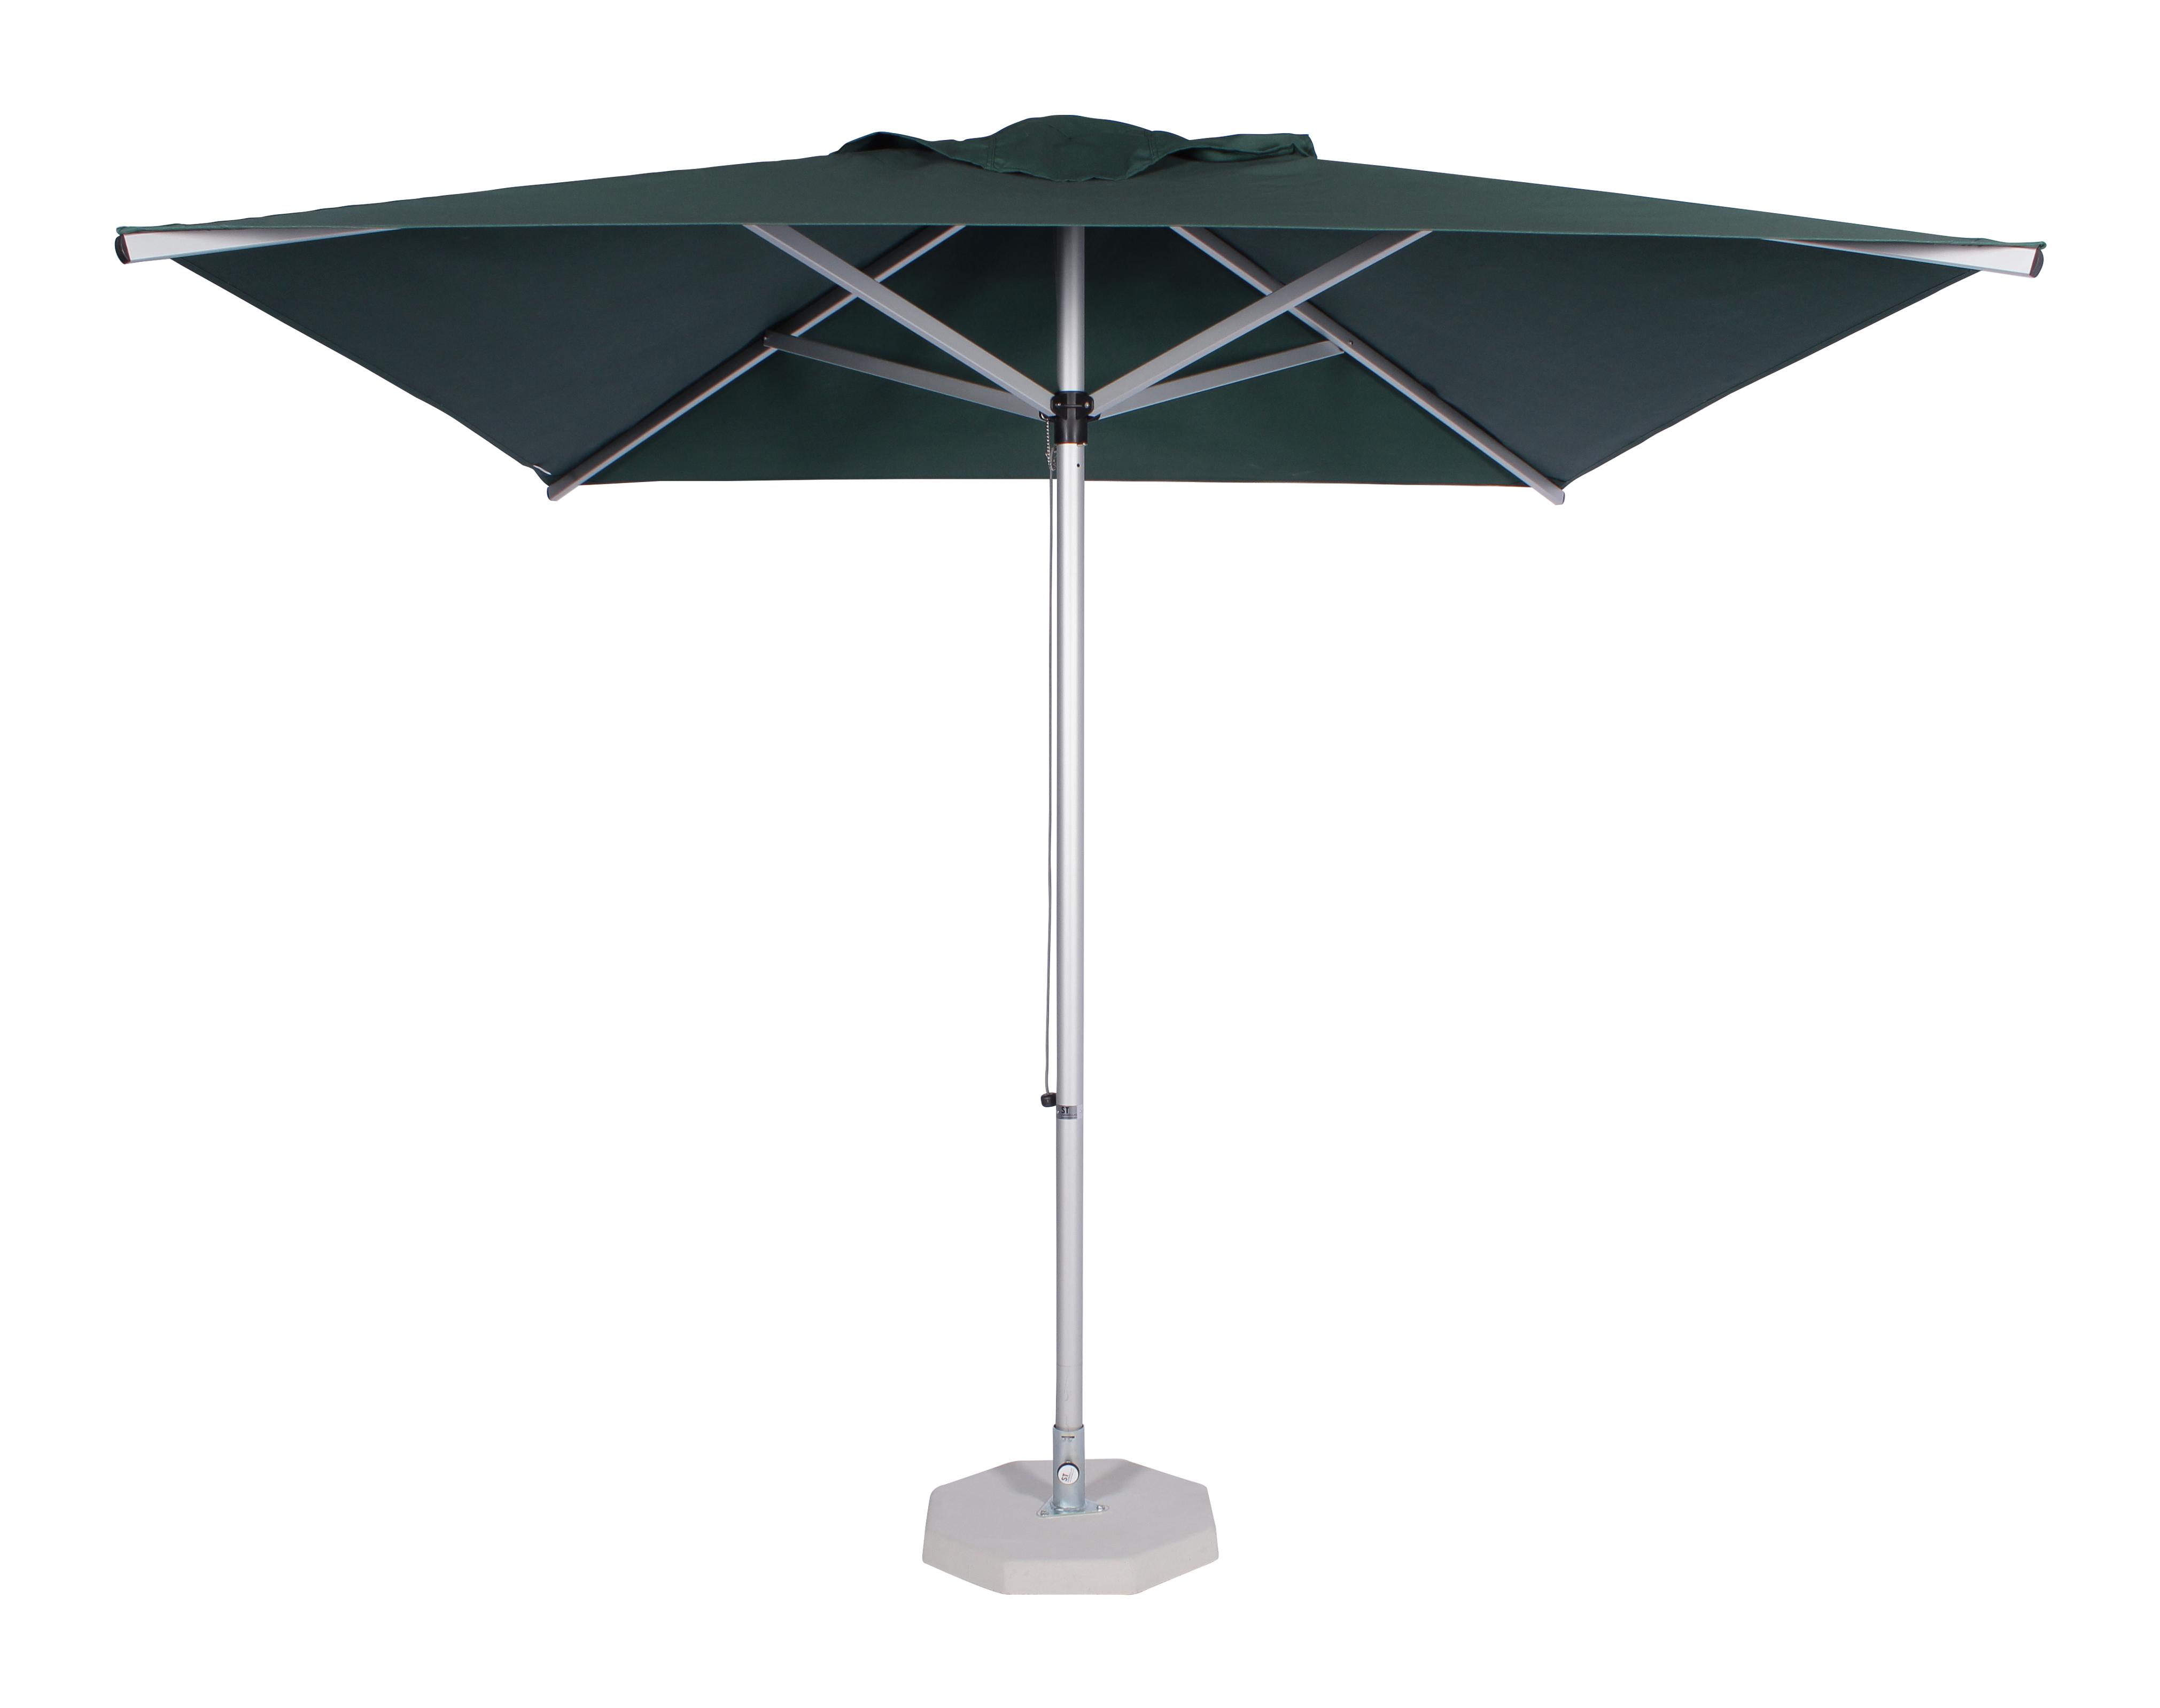 2.35m Square Alu Umbrella-Green